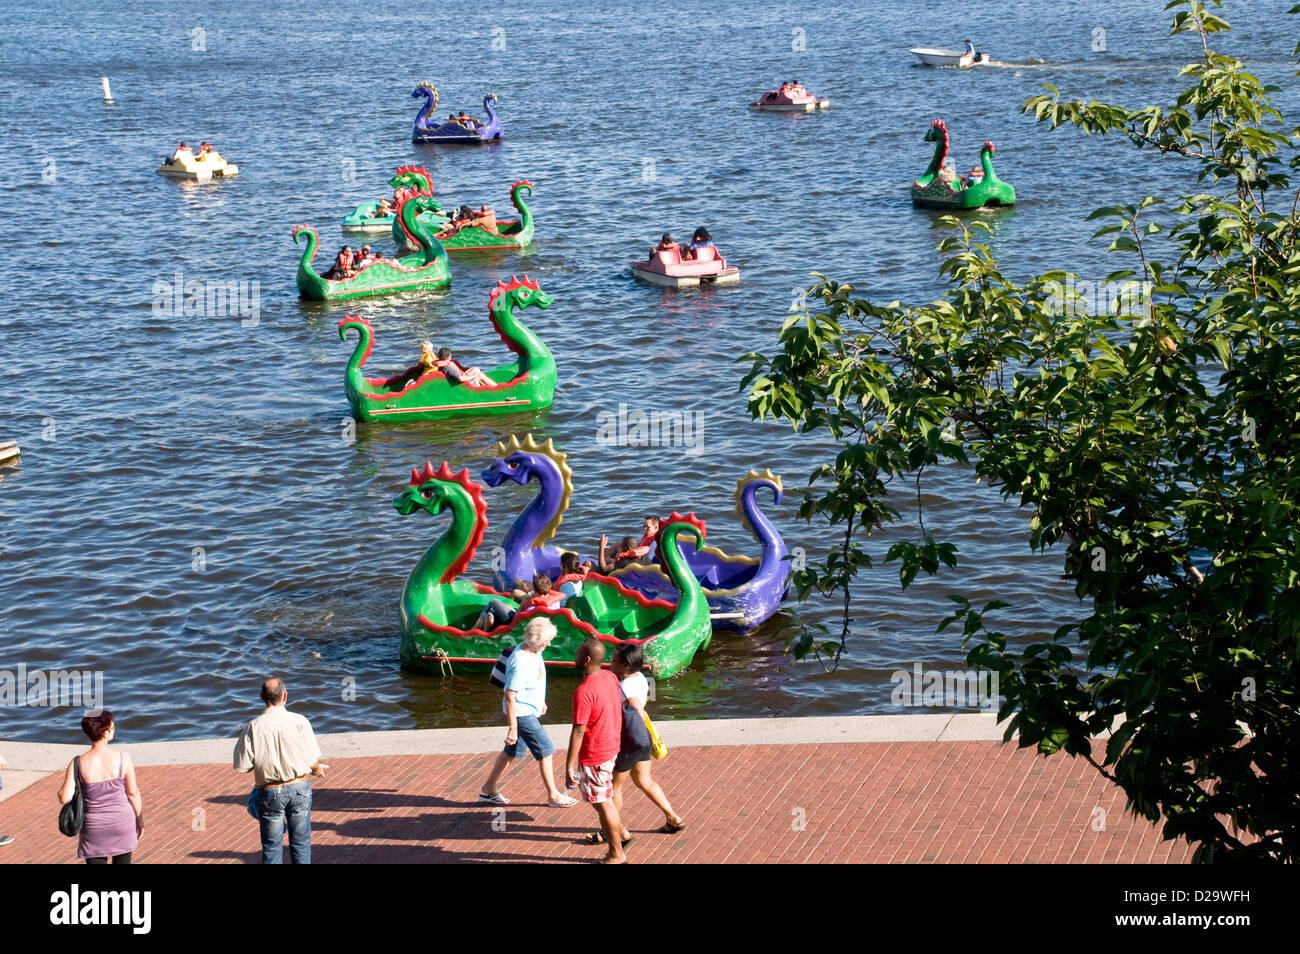 Baltimore Harbor, Maryland, Paddle Boats - Stock Image